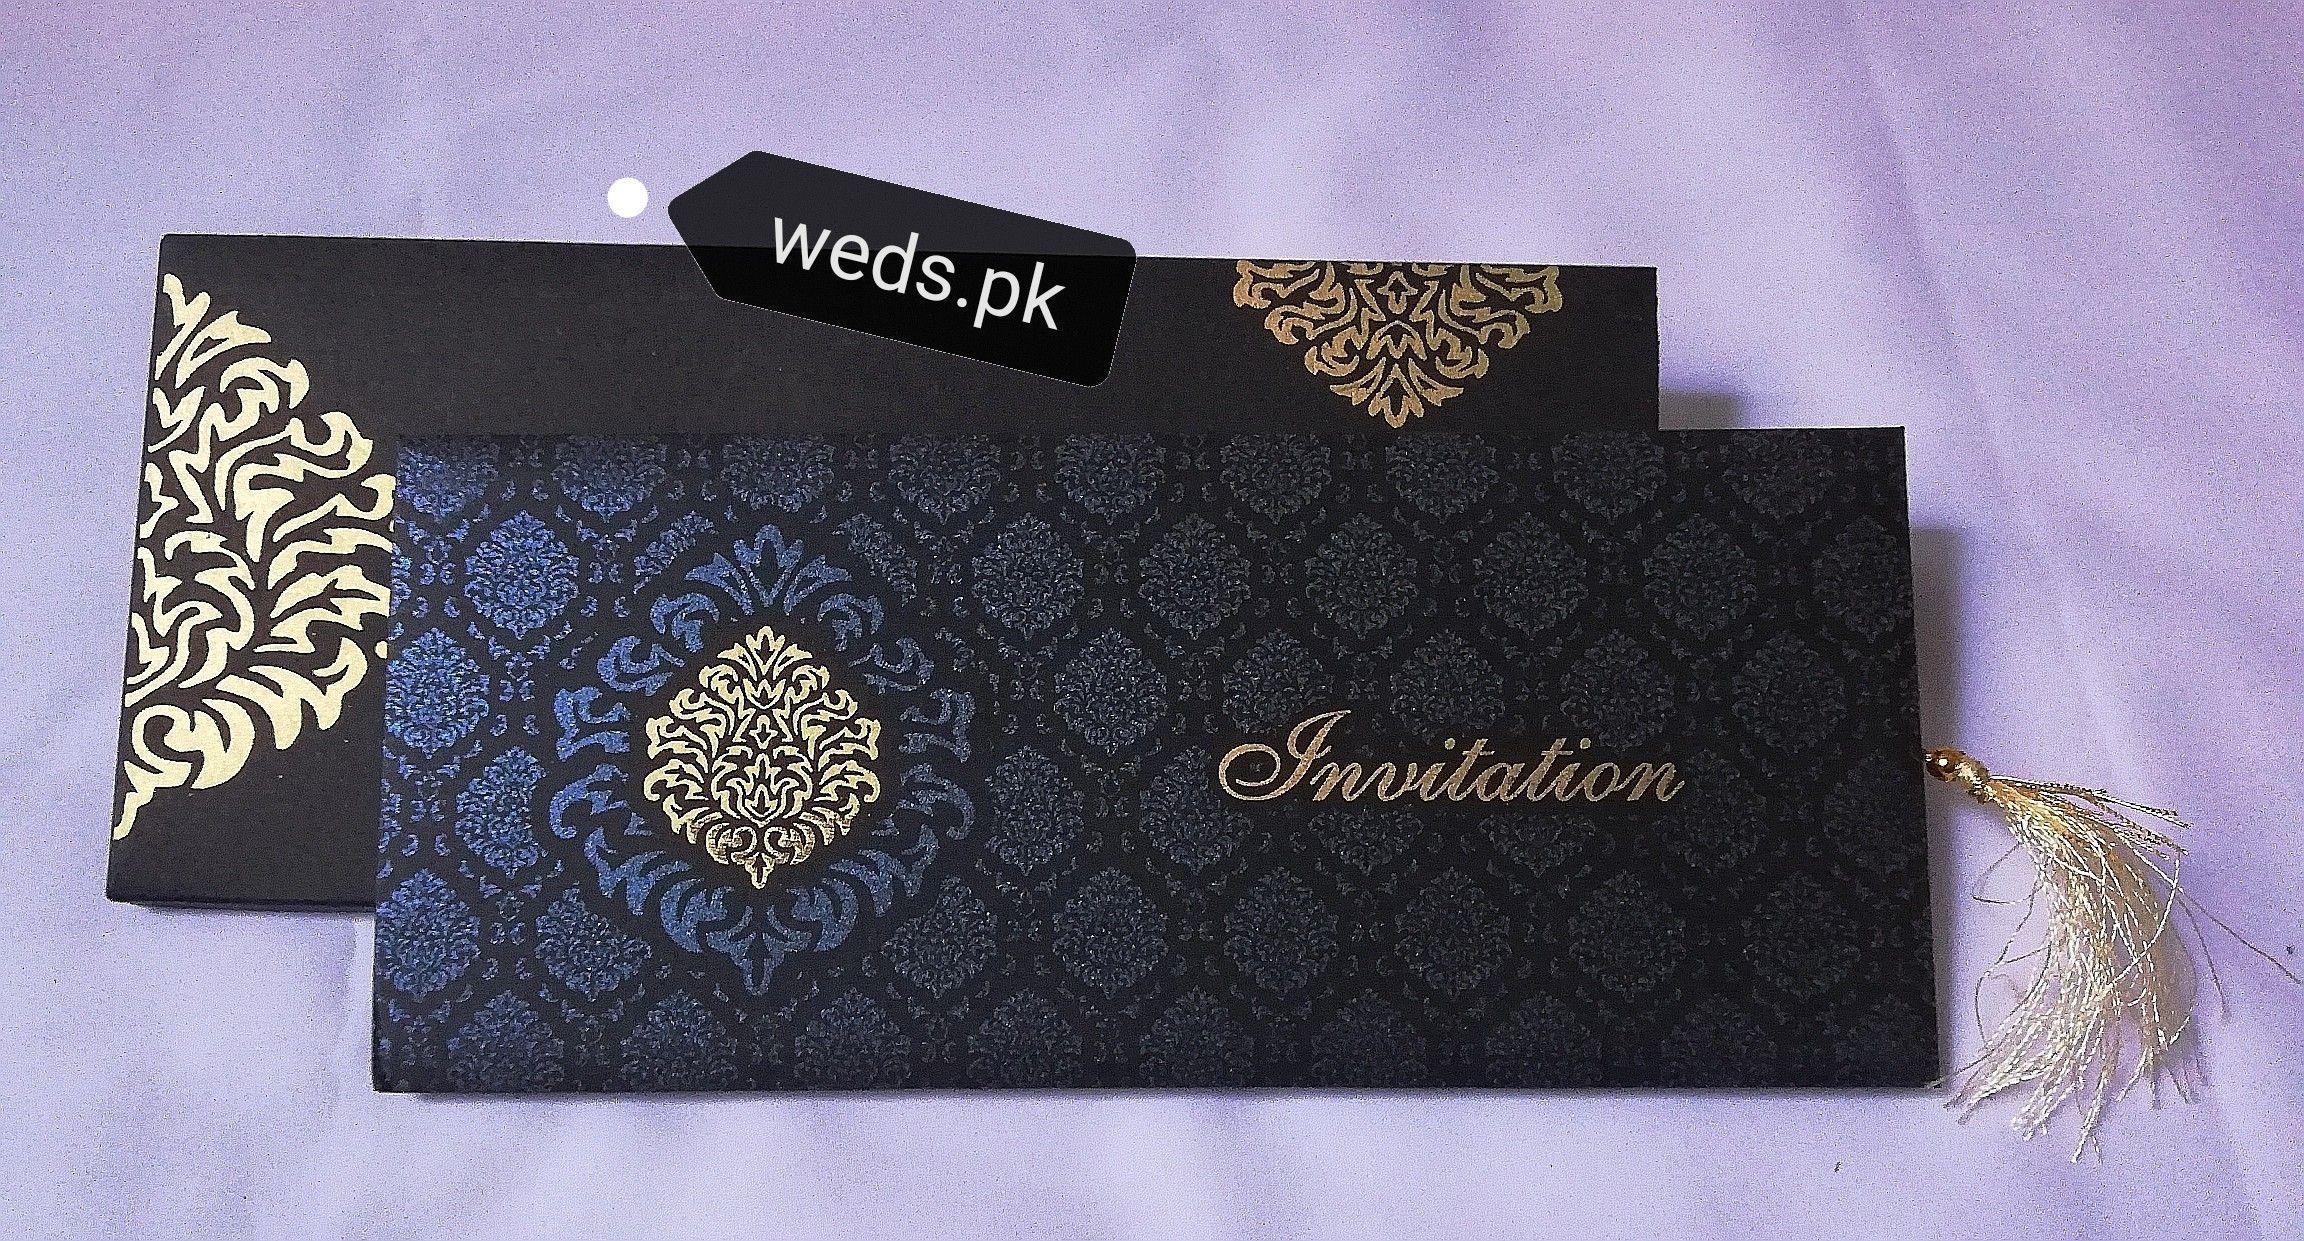 Wedding Cards Pakistan Pakistani Wedding Cards Wedding Cards Wedding Card Design Online